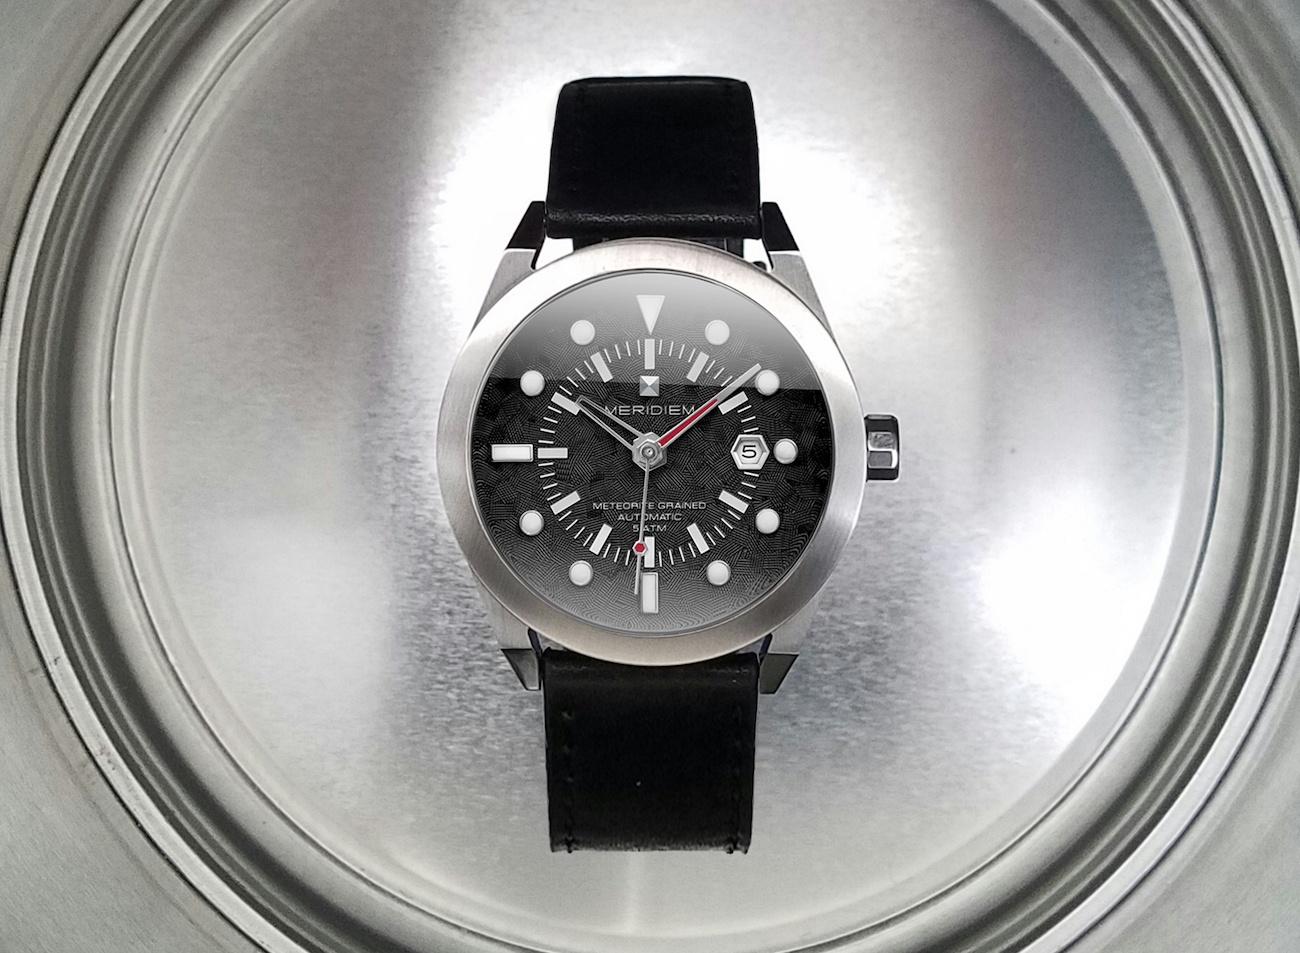 Meridiem Free Energy AM Watch Collection